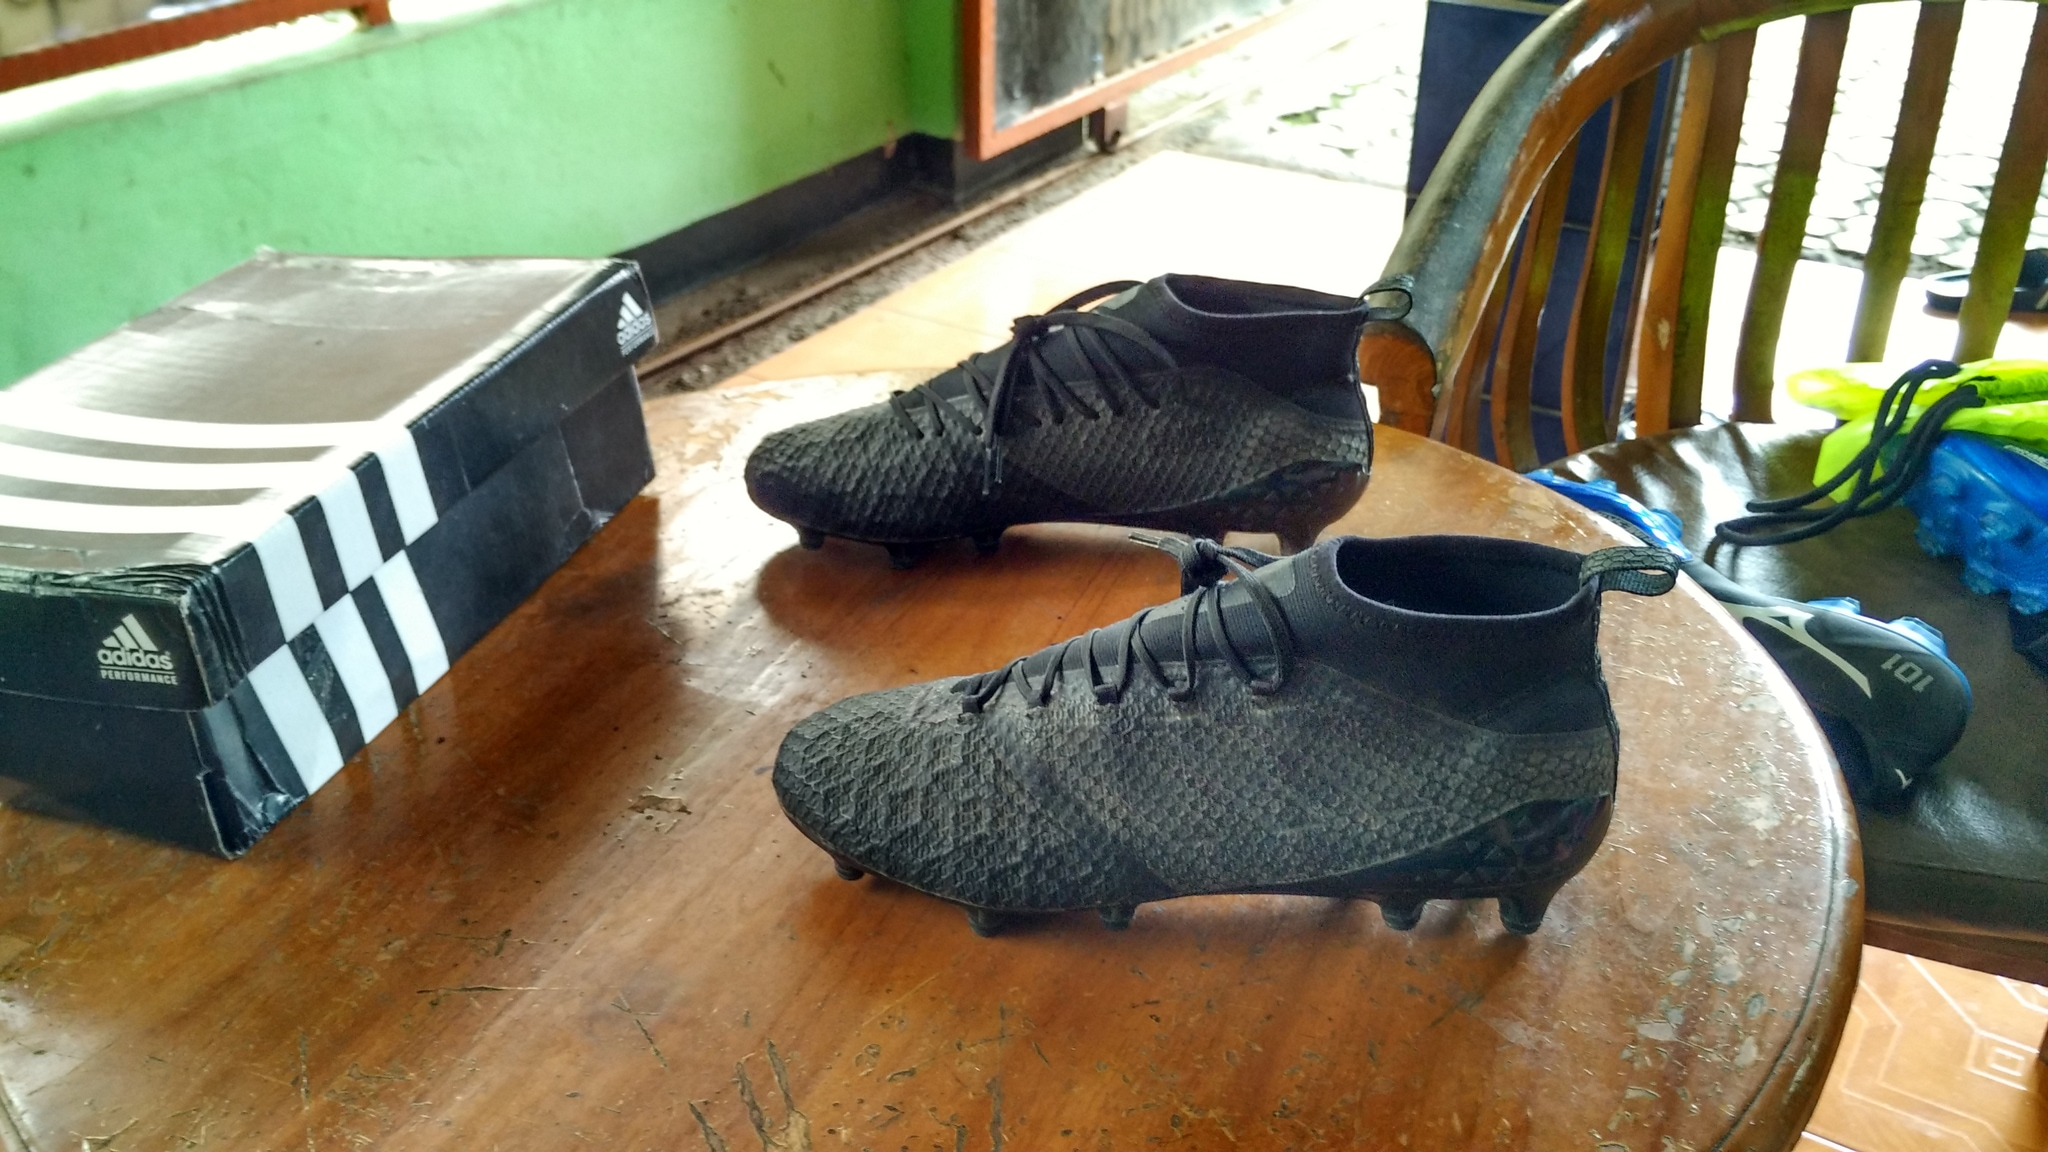 Jual Sepatu Bola Original Adidas Ace 17.1 PRIMEKNIT BLACKOUT ... 559c1e1094